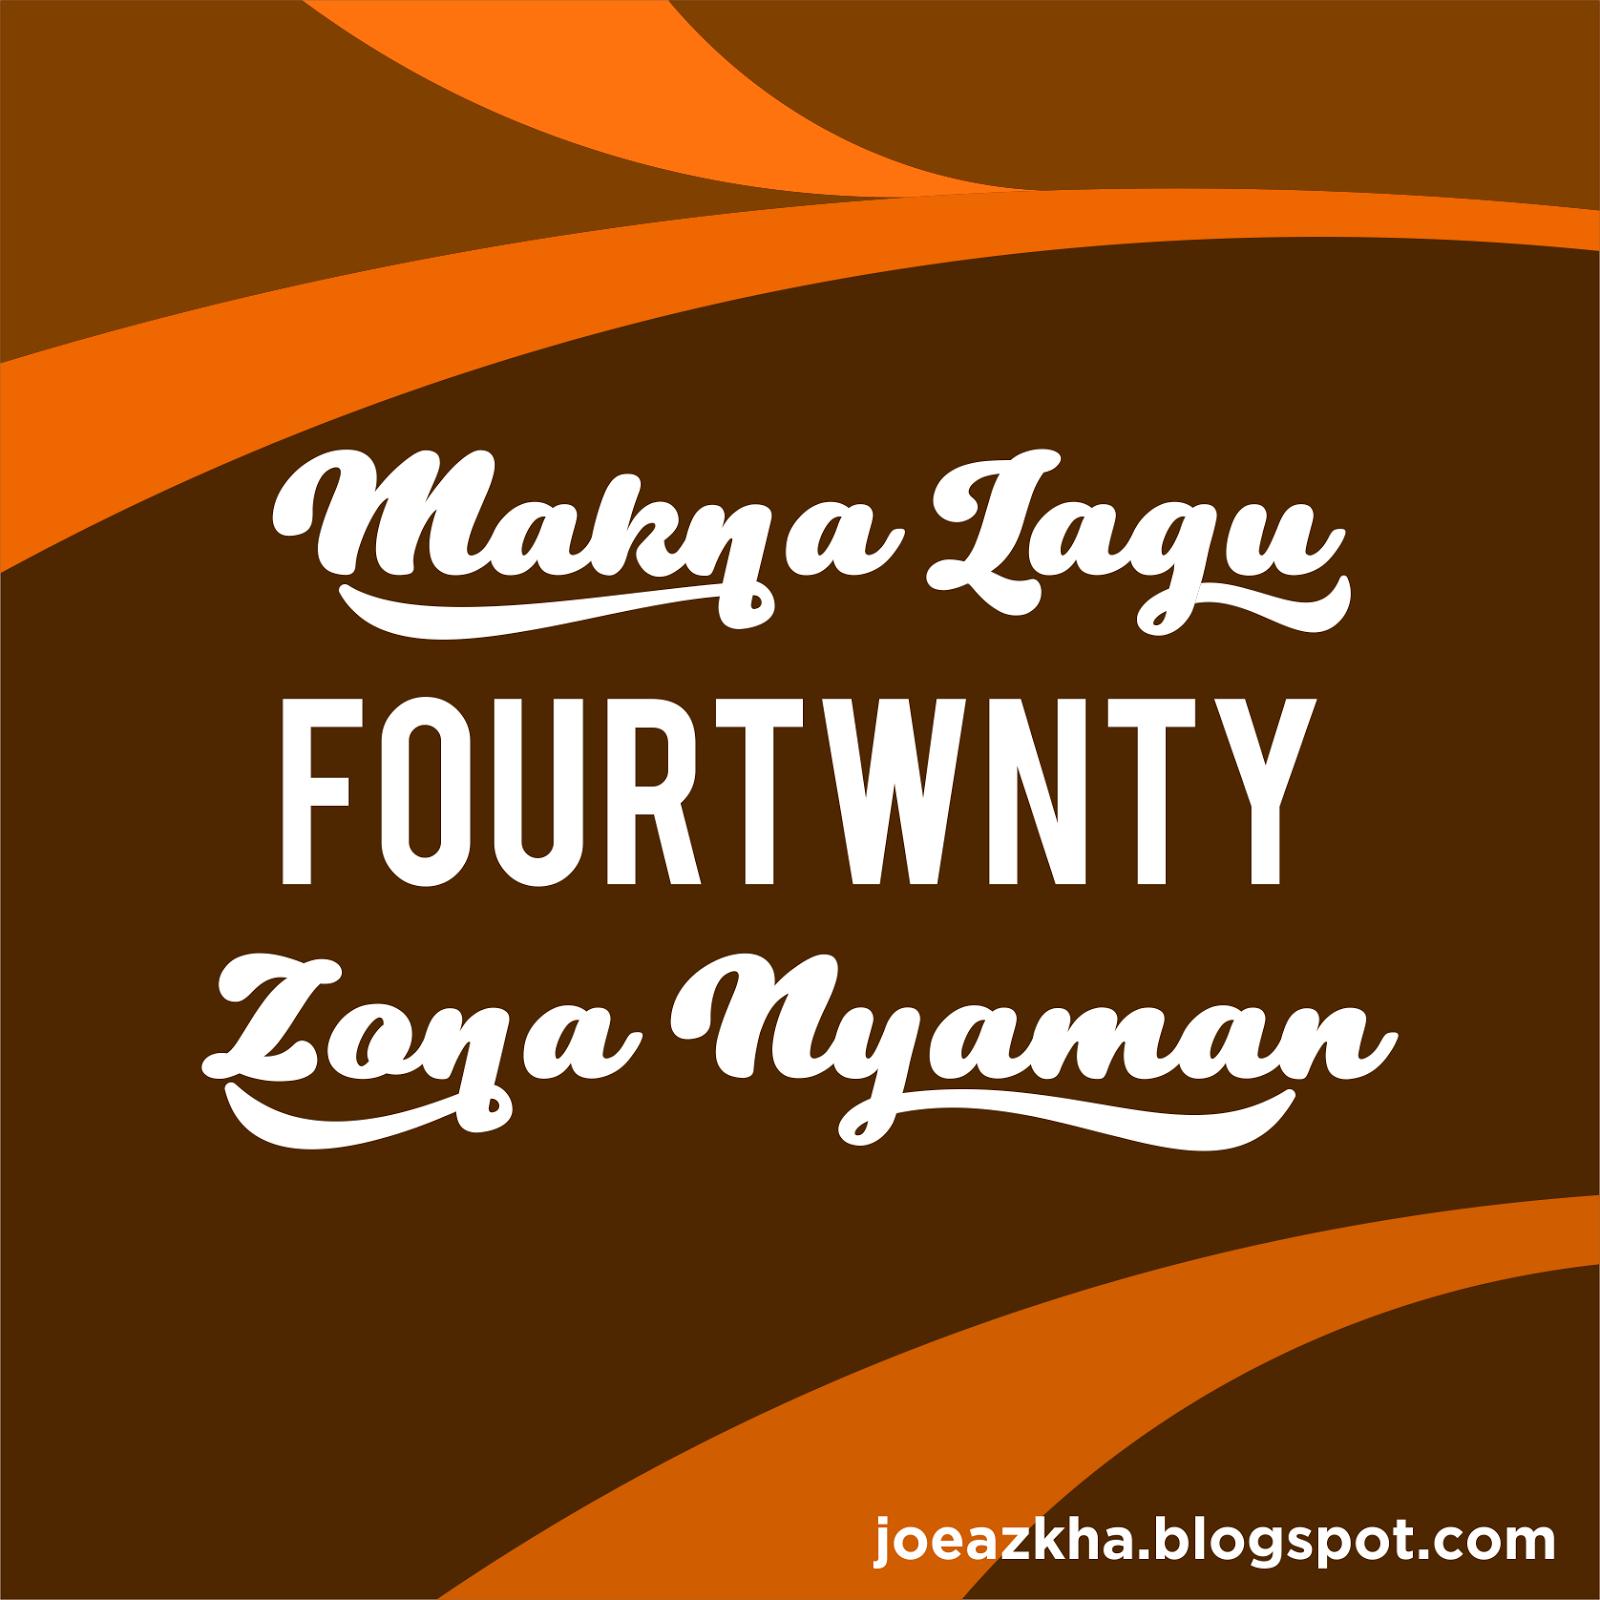 Makna Sebenarnya Dari Lirik Lagu Fourtwnty